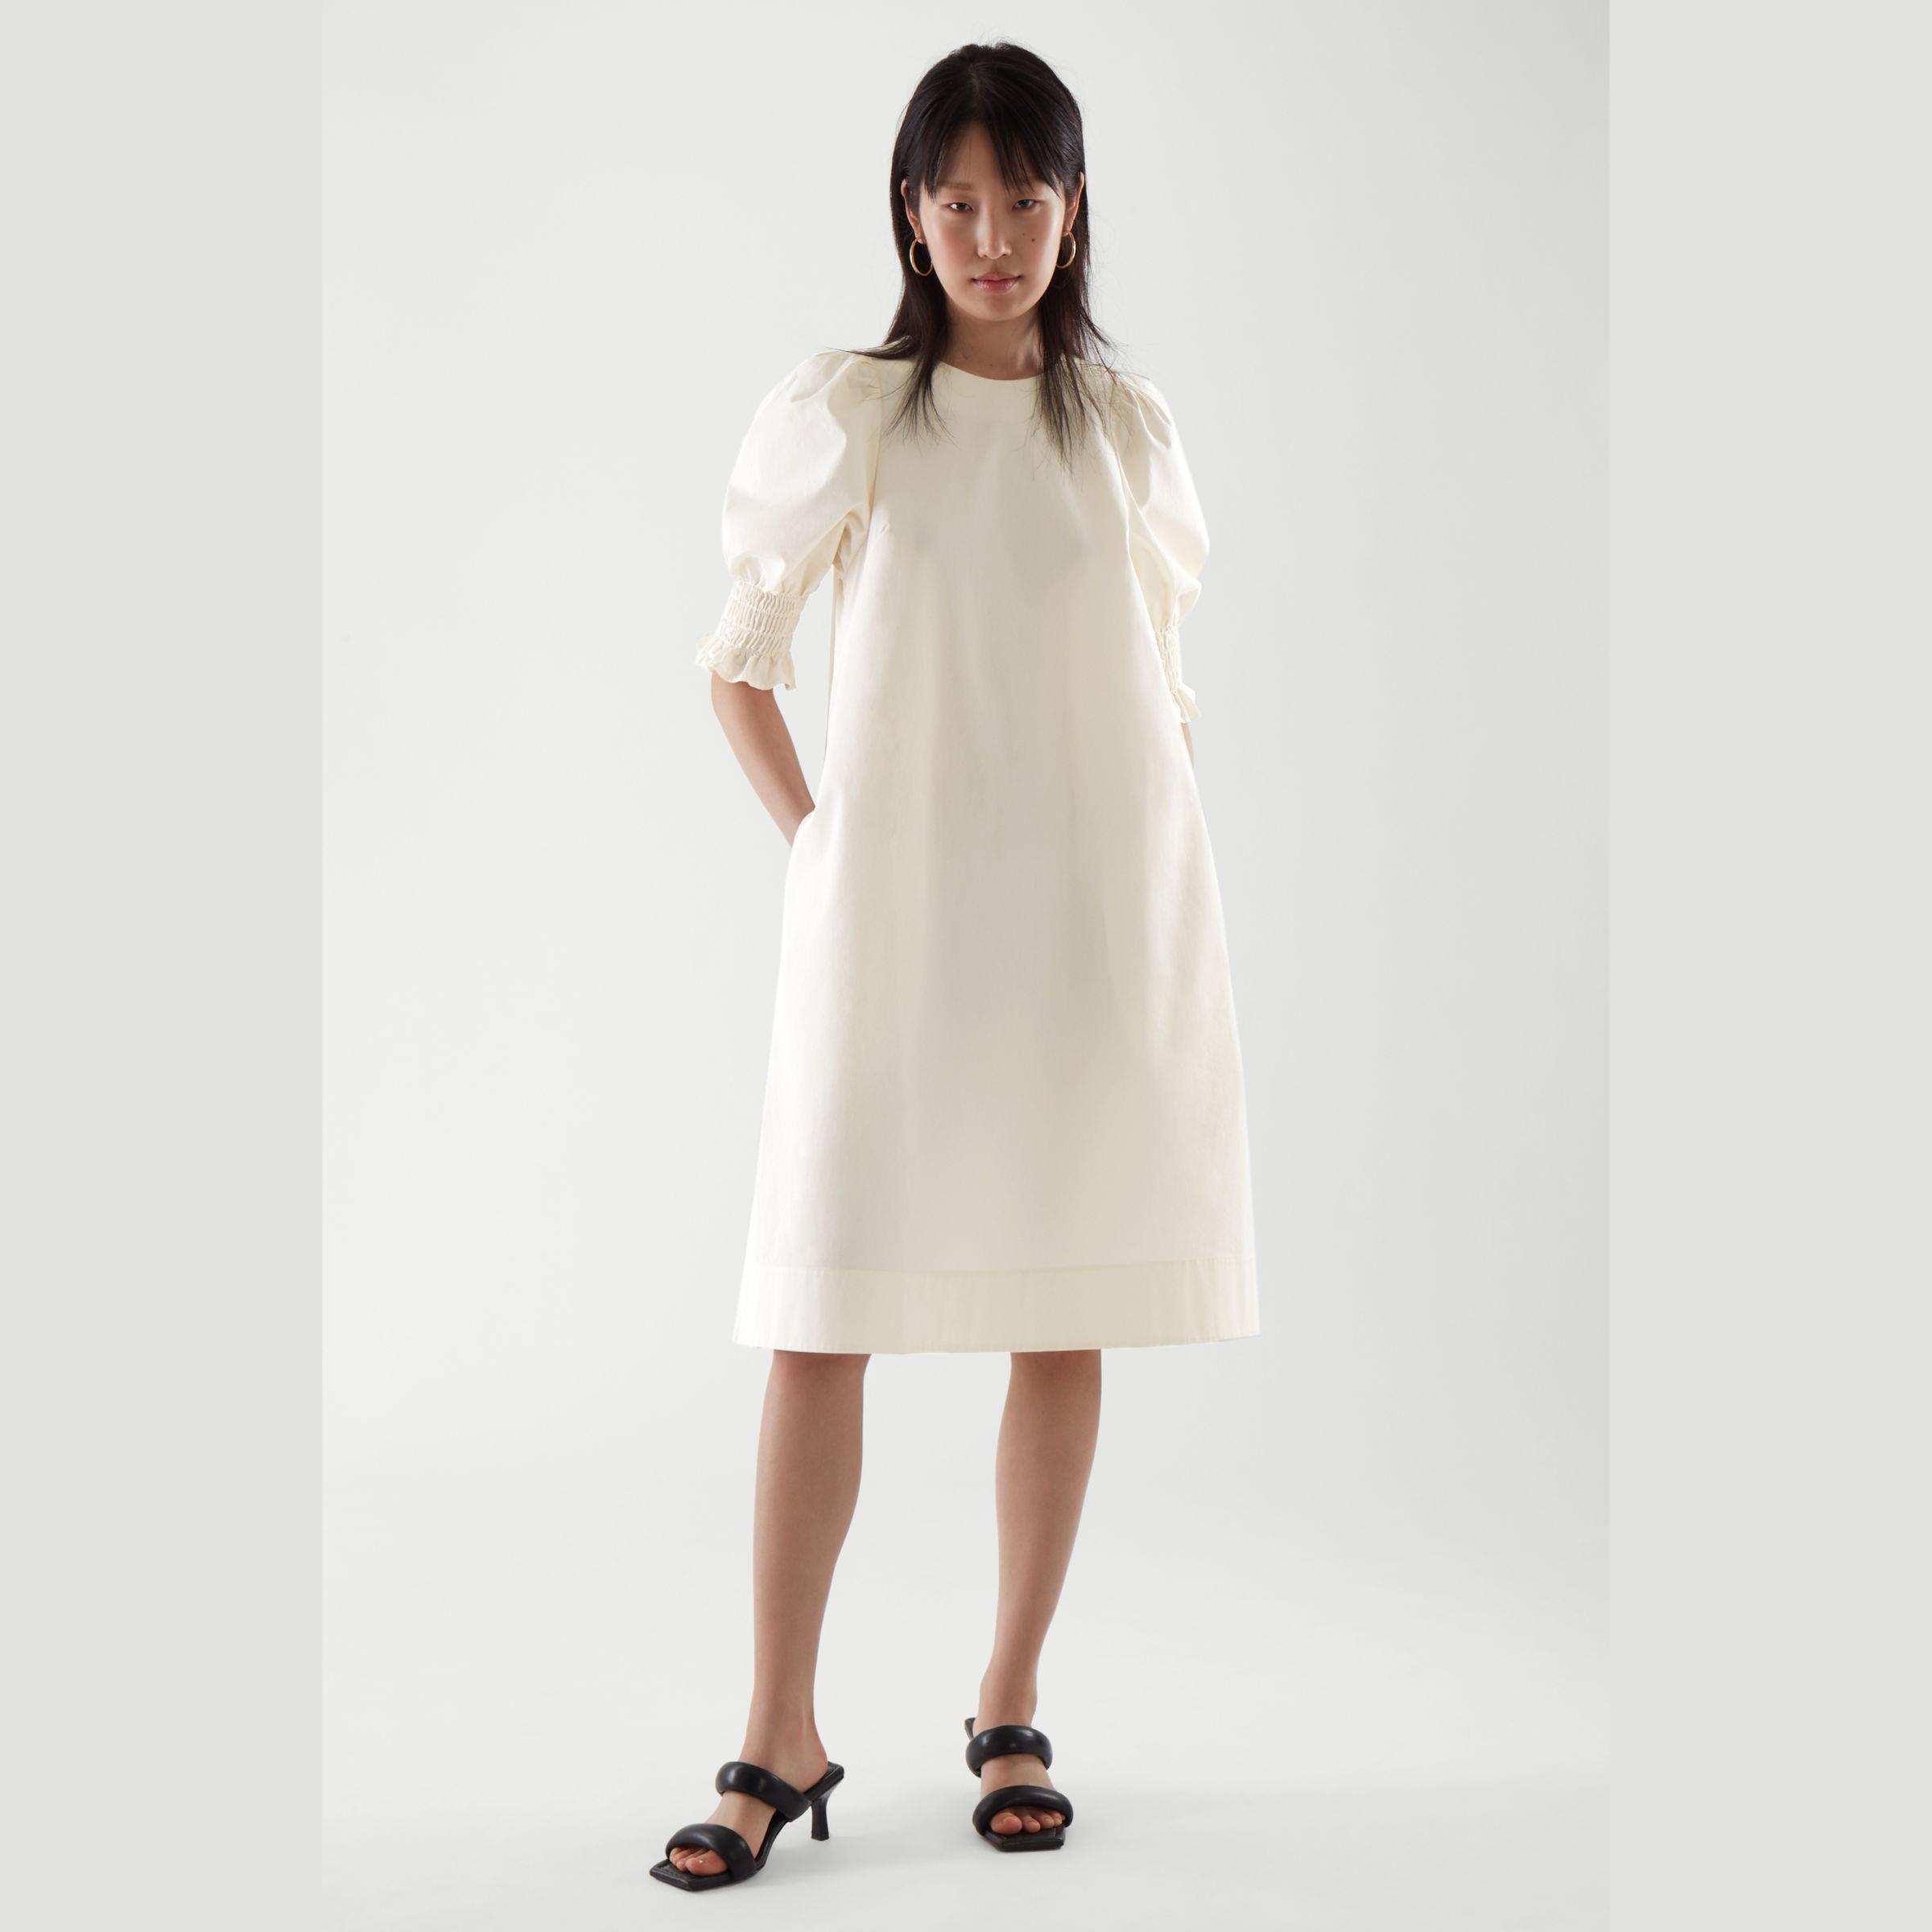 COS 泡泡袖奶油色长裙 8折